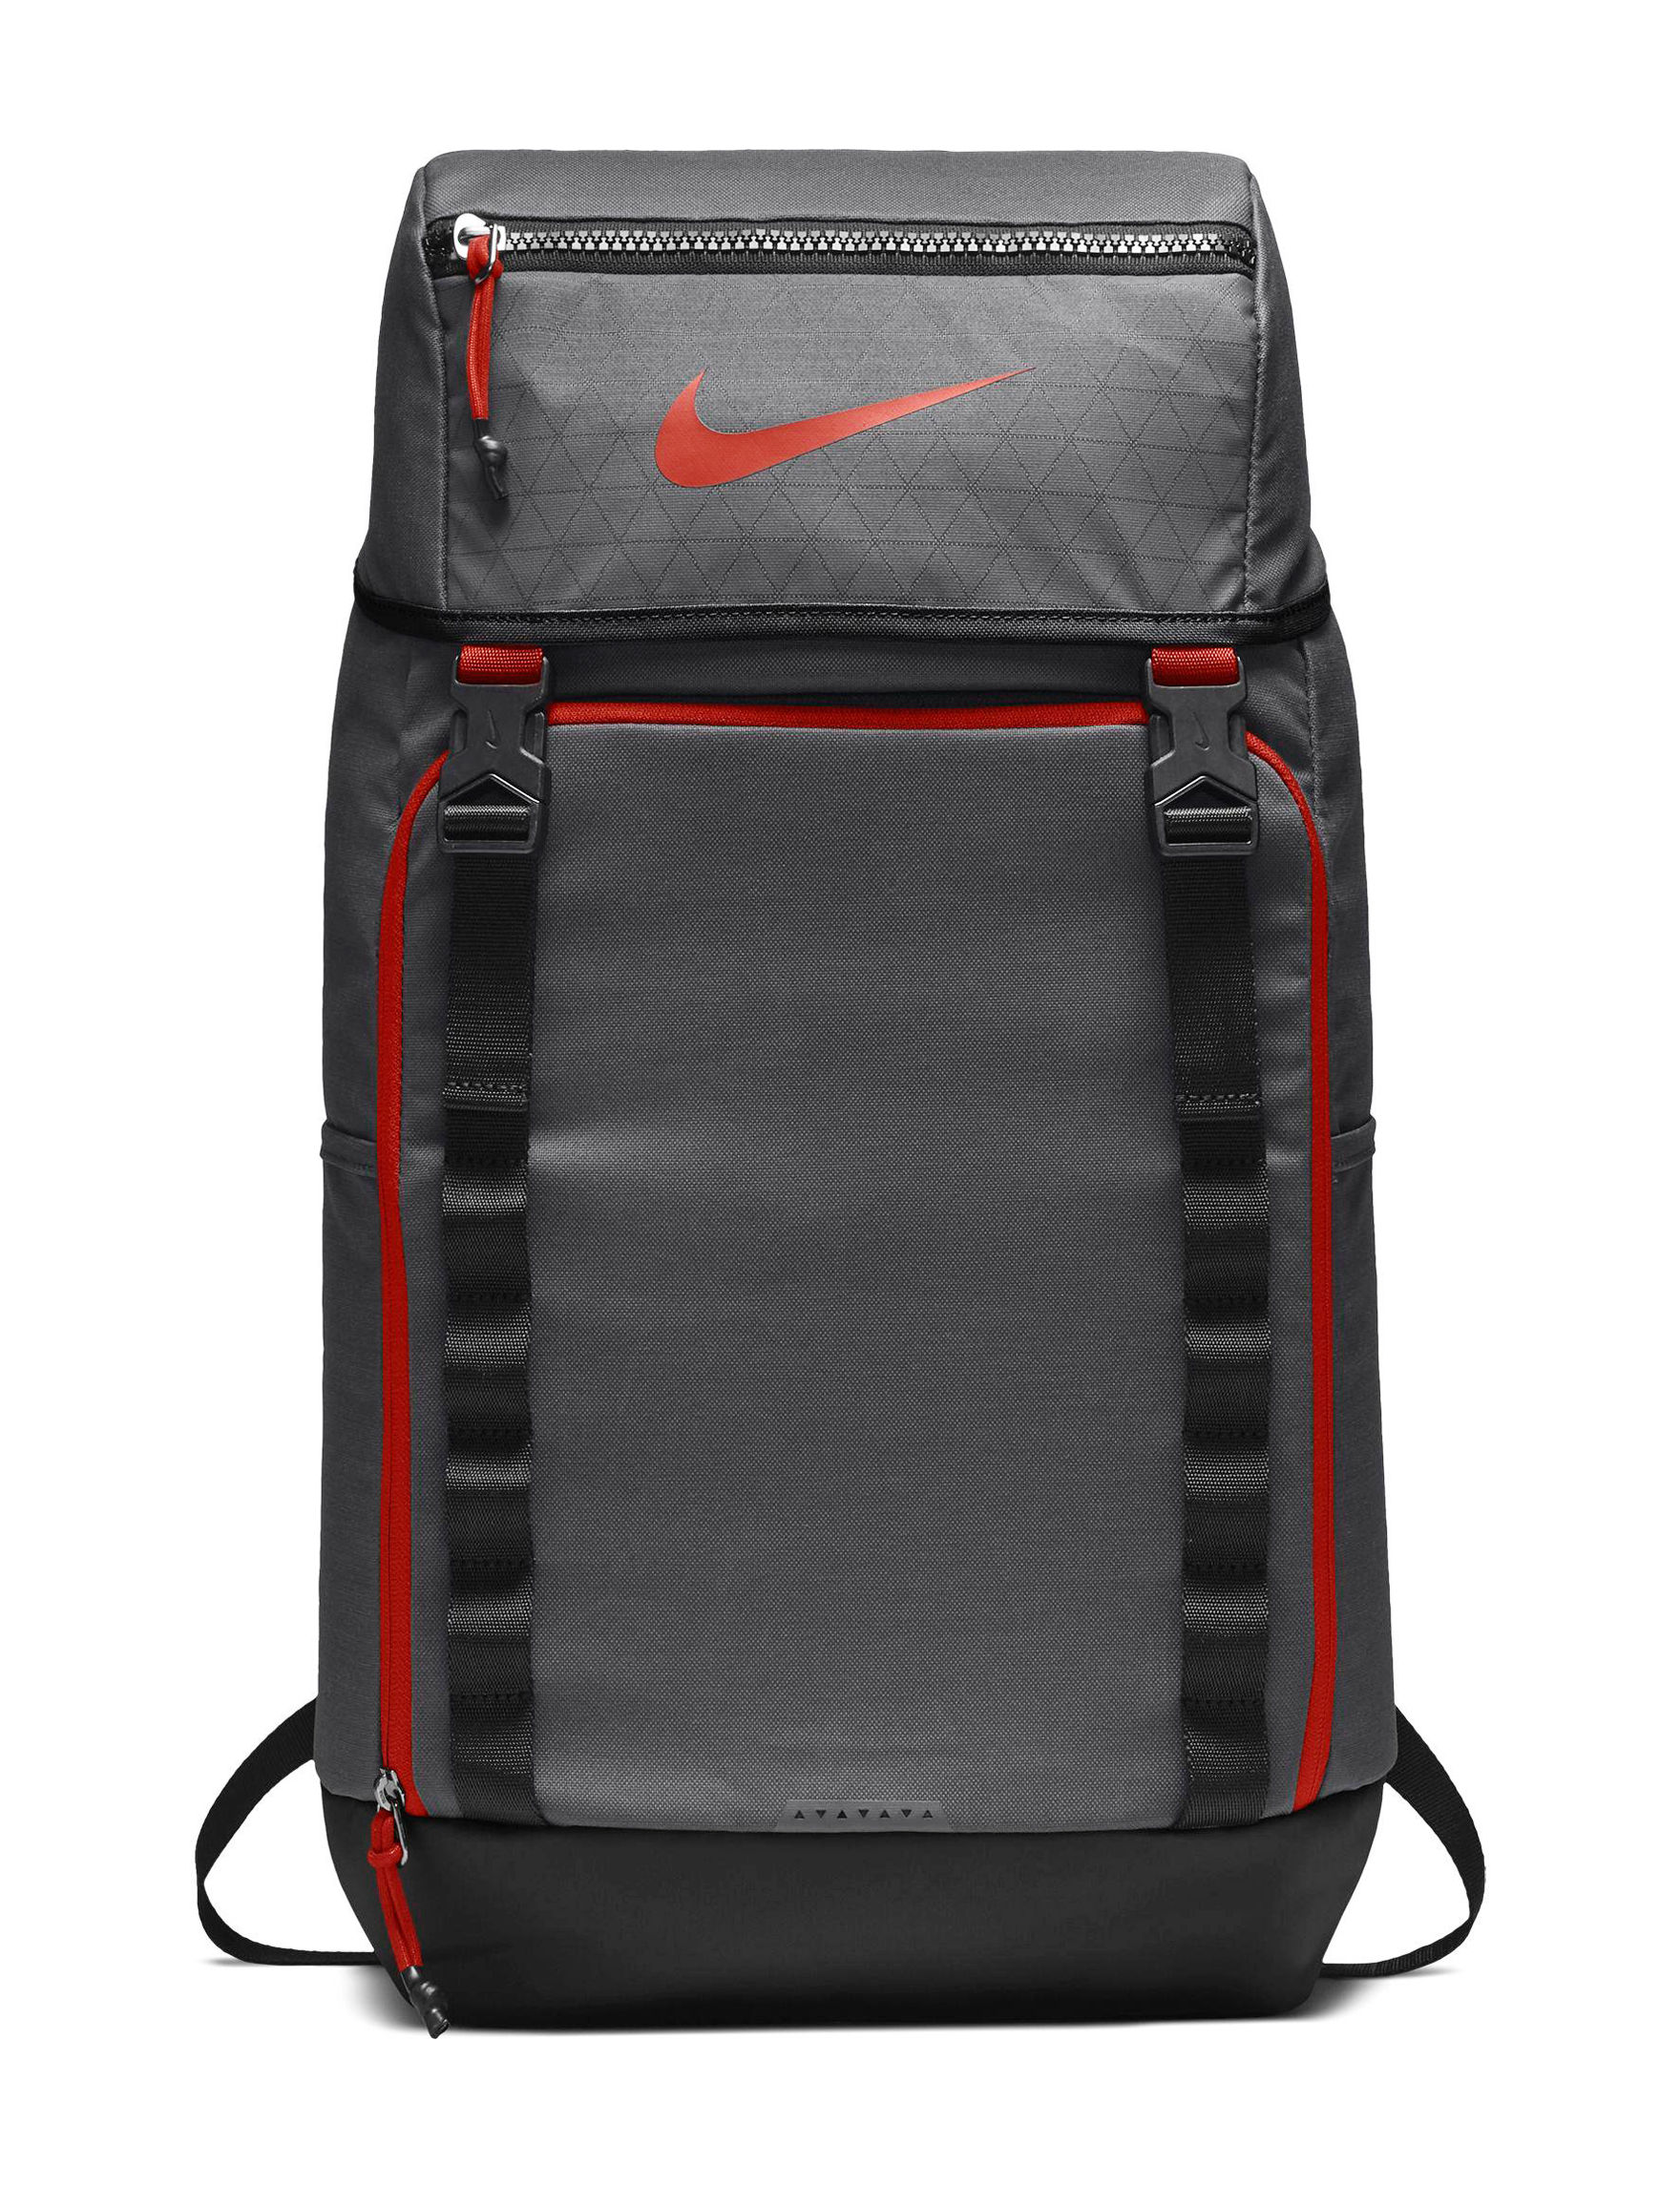 Nike Grey / Red Bookbags & Backpacks